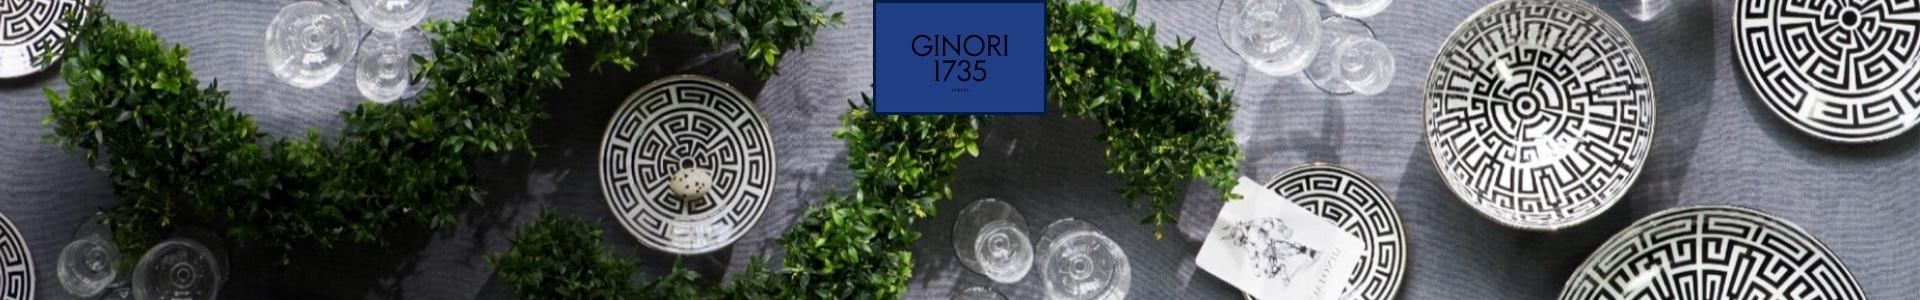 banner richard ginori shop online code discount sale codice sconto